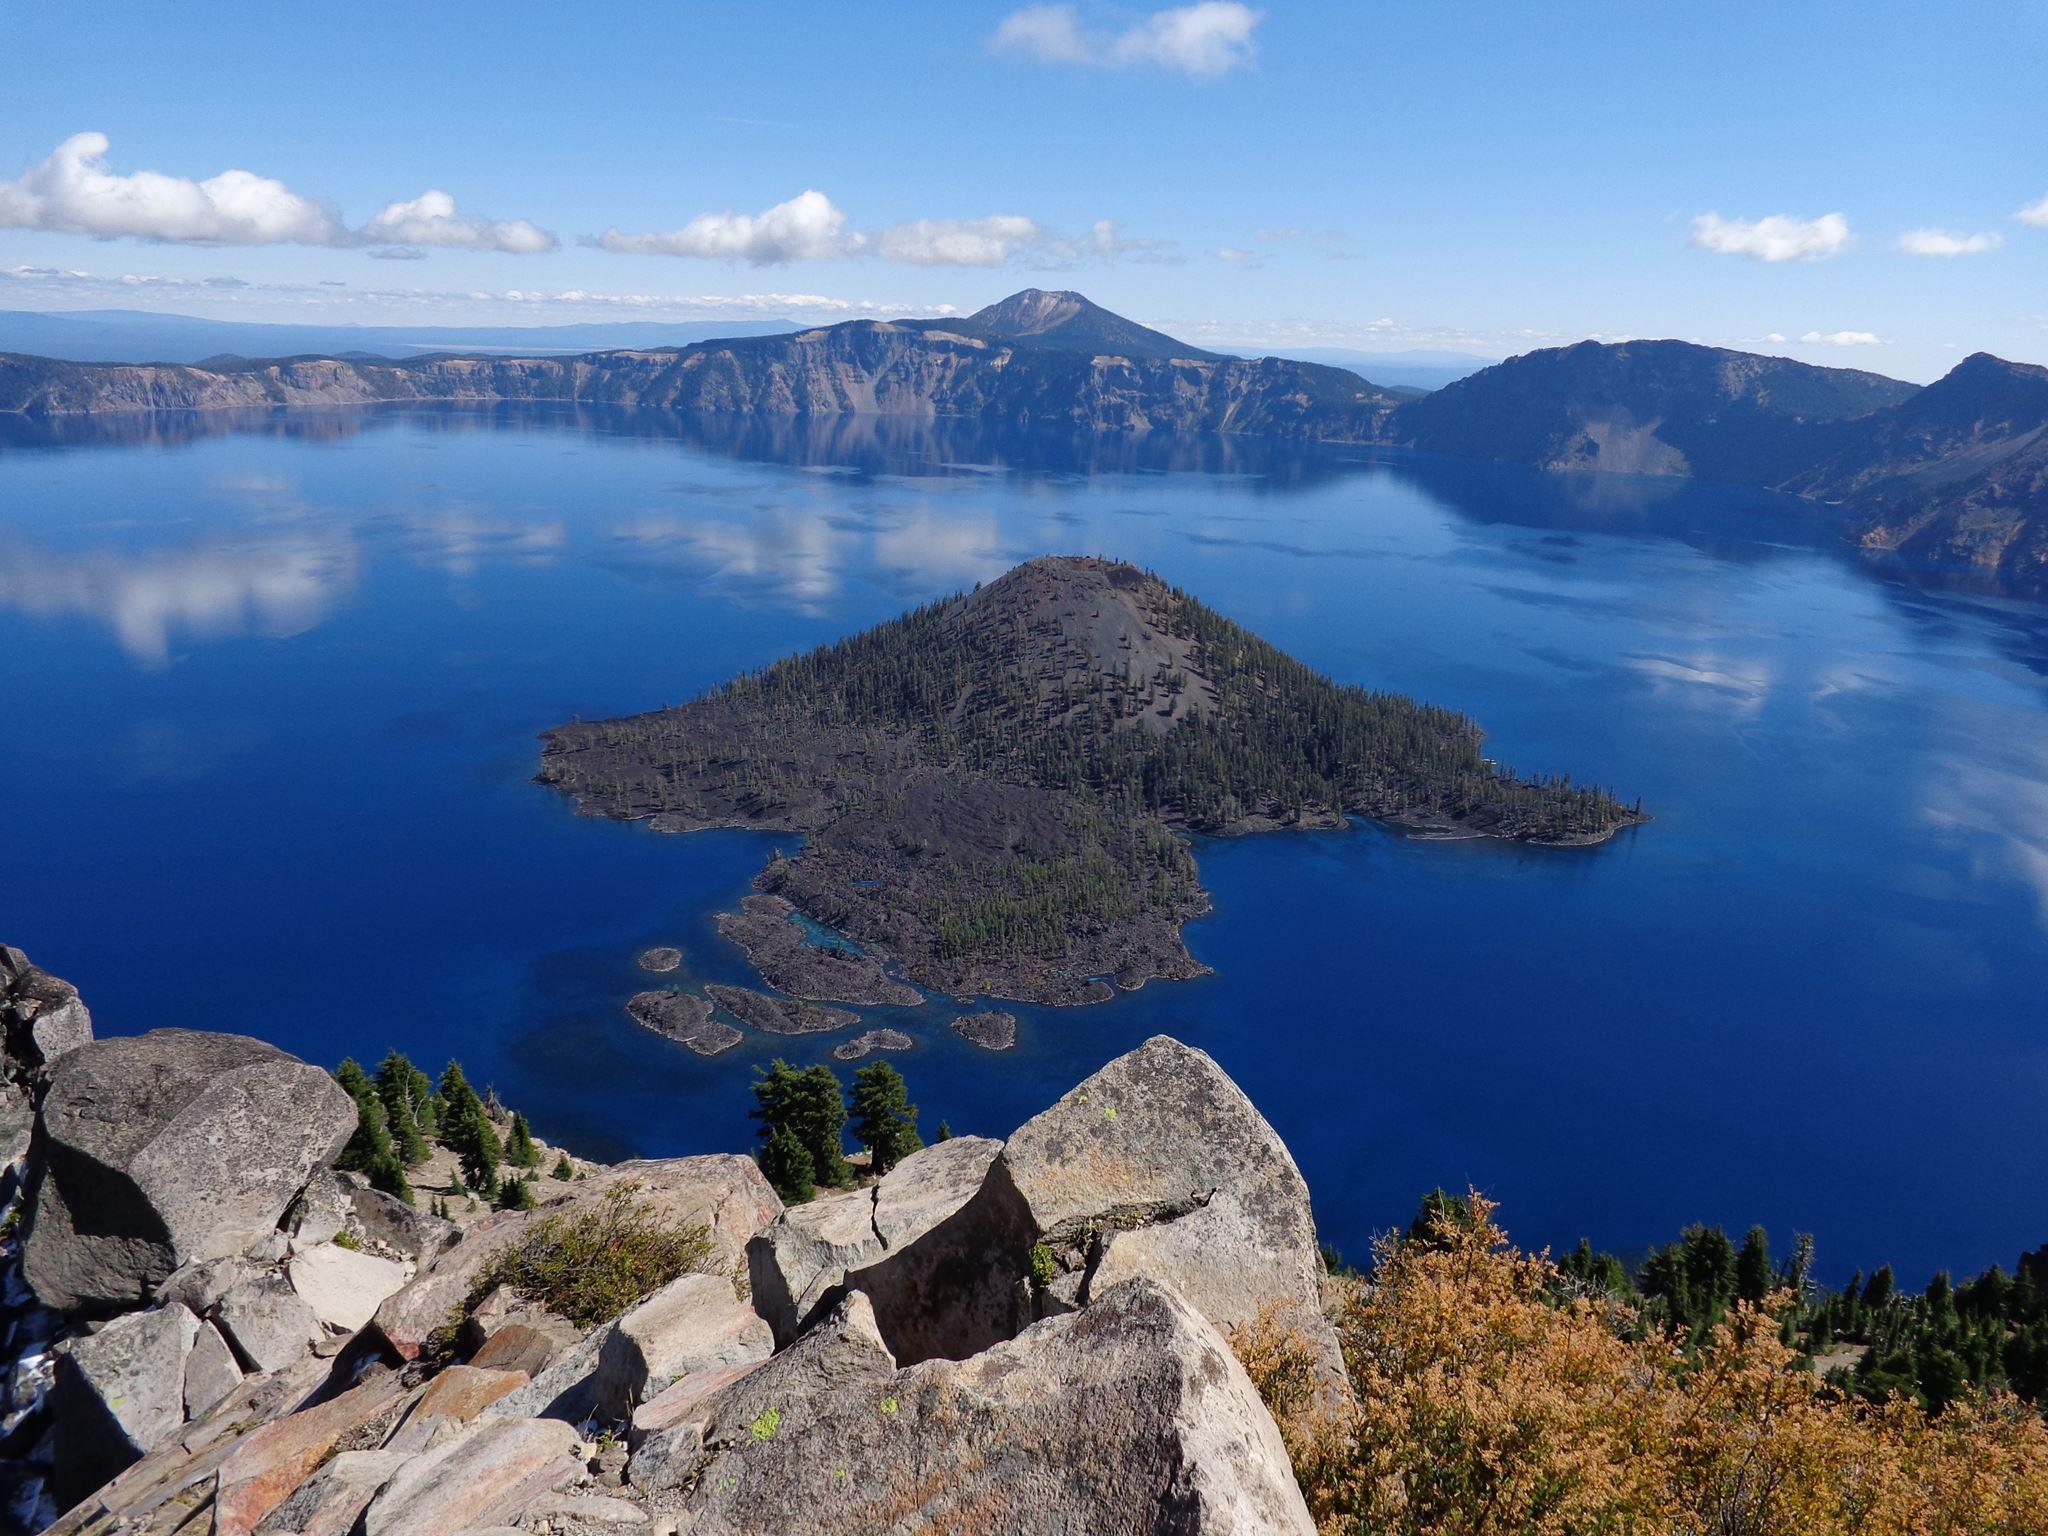 Crater Lake National Park | MowryJournal.com